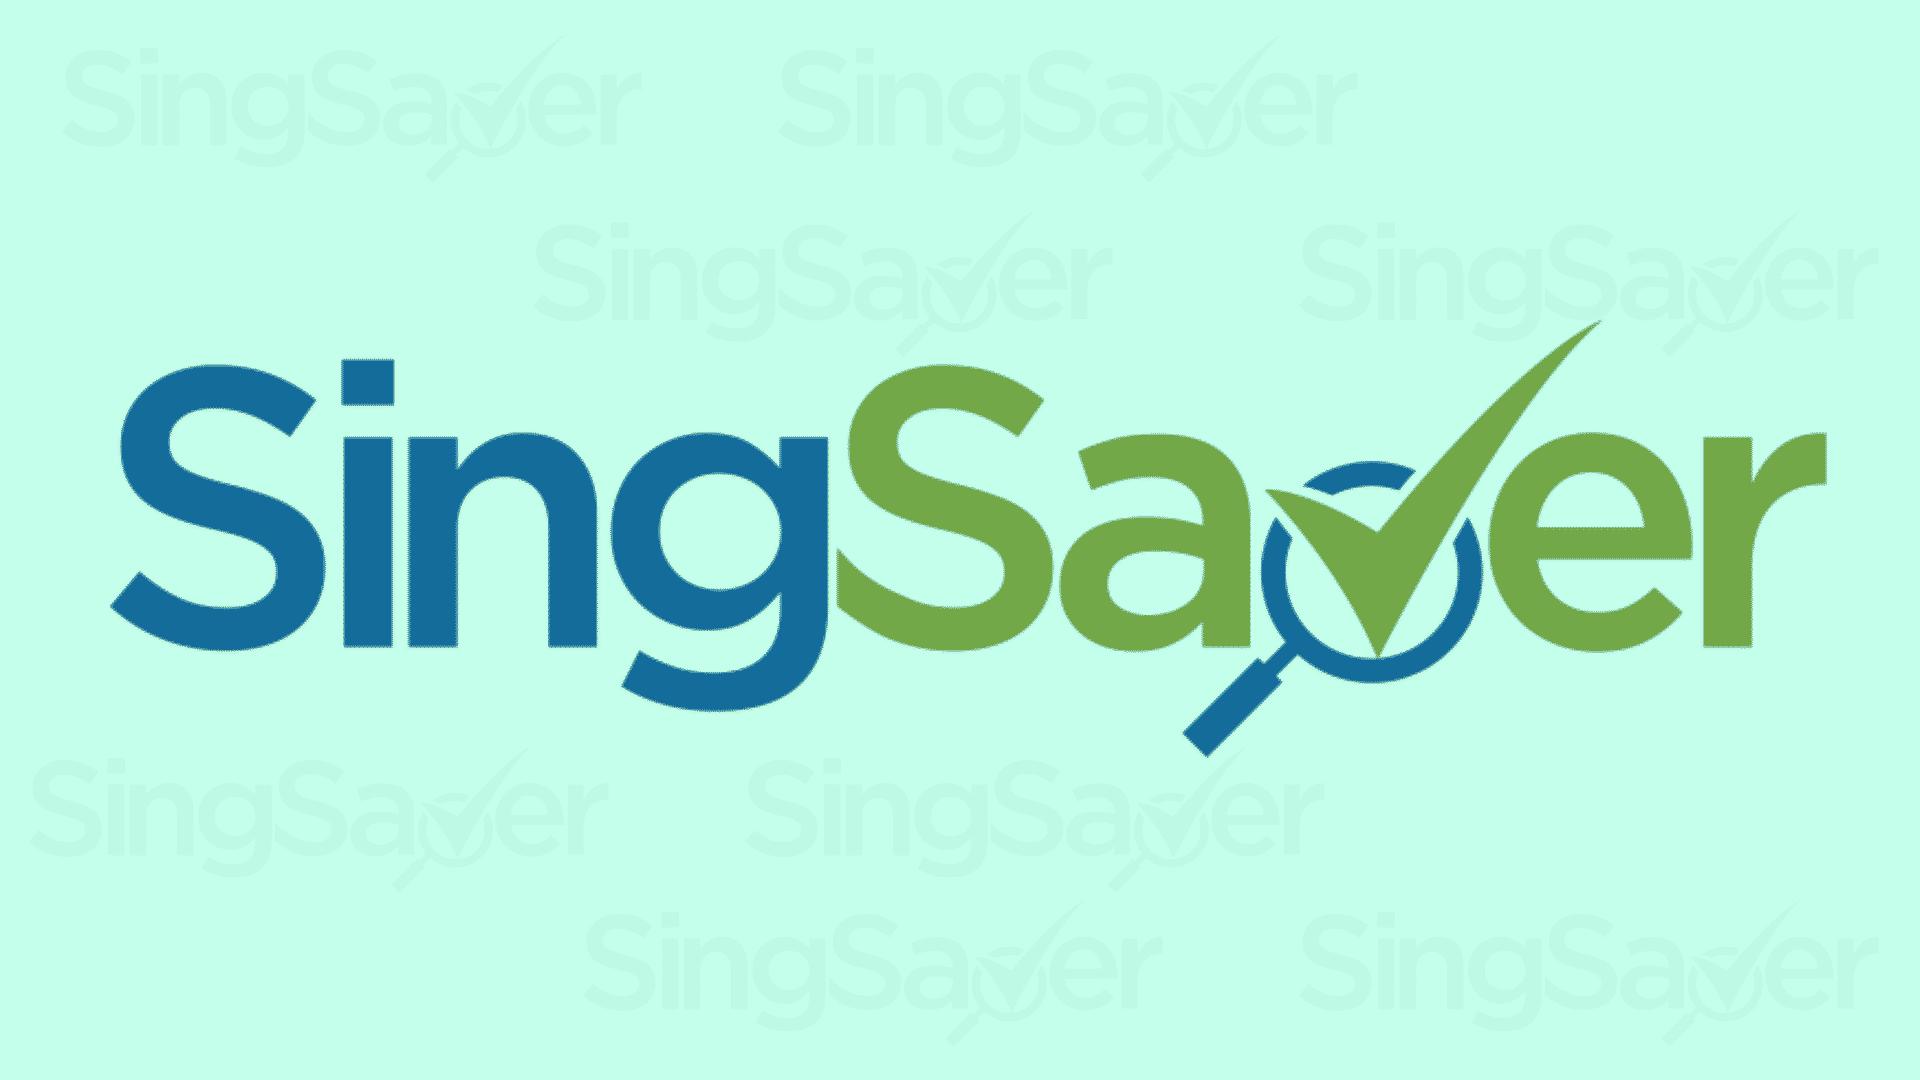 SingSaver Obtains MAS Brokerage License to Provide Insurance Comparisons